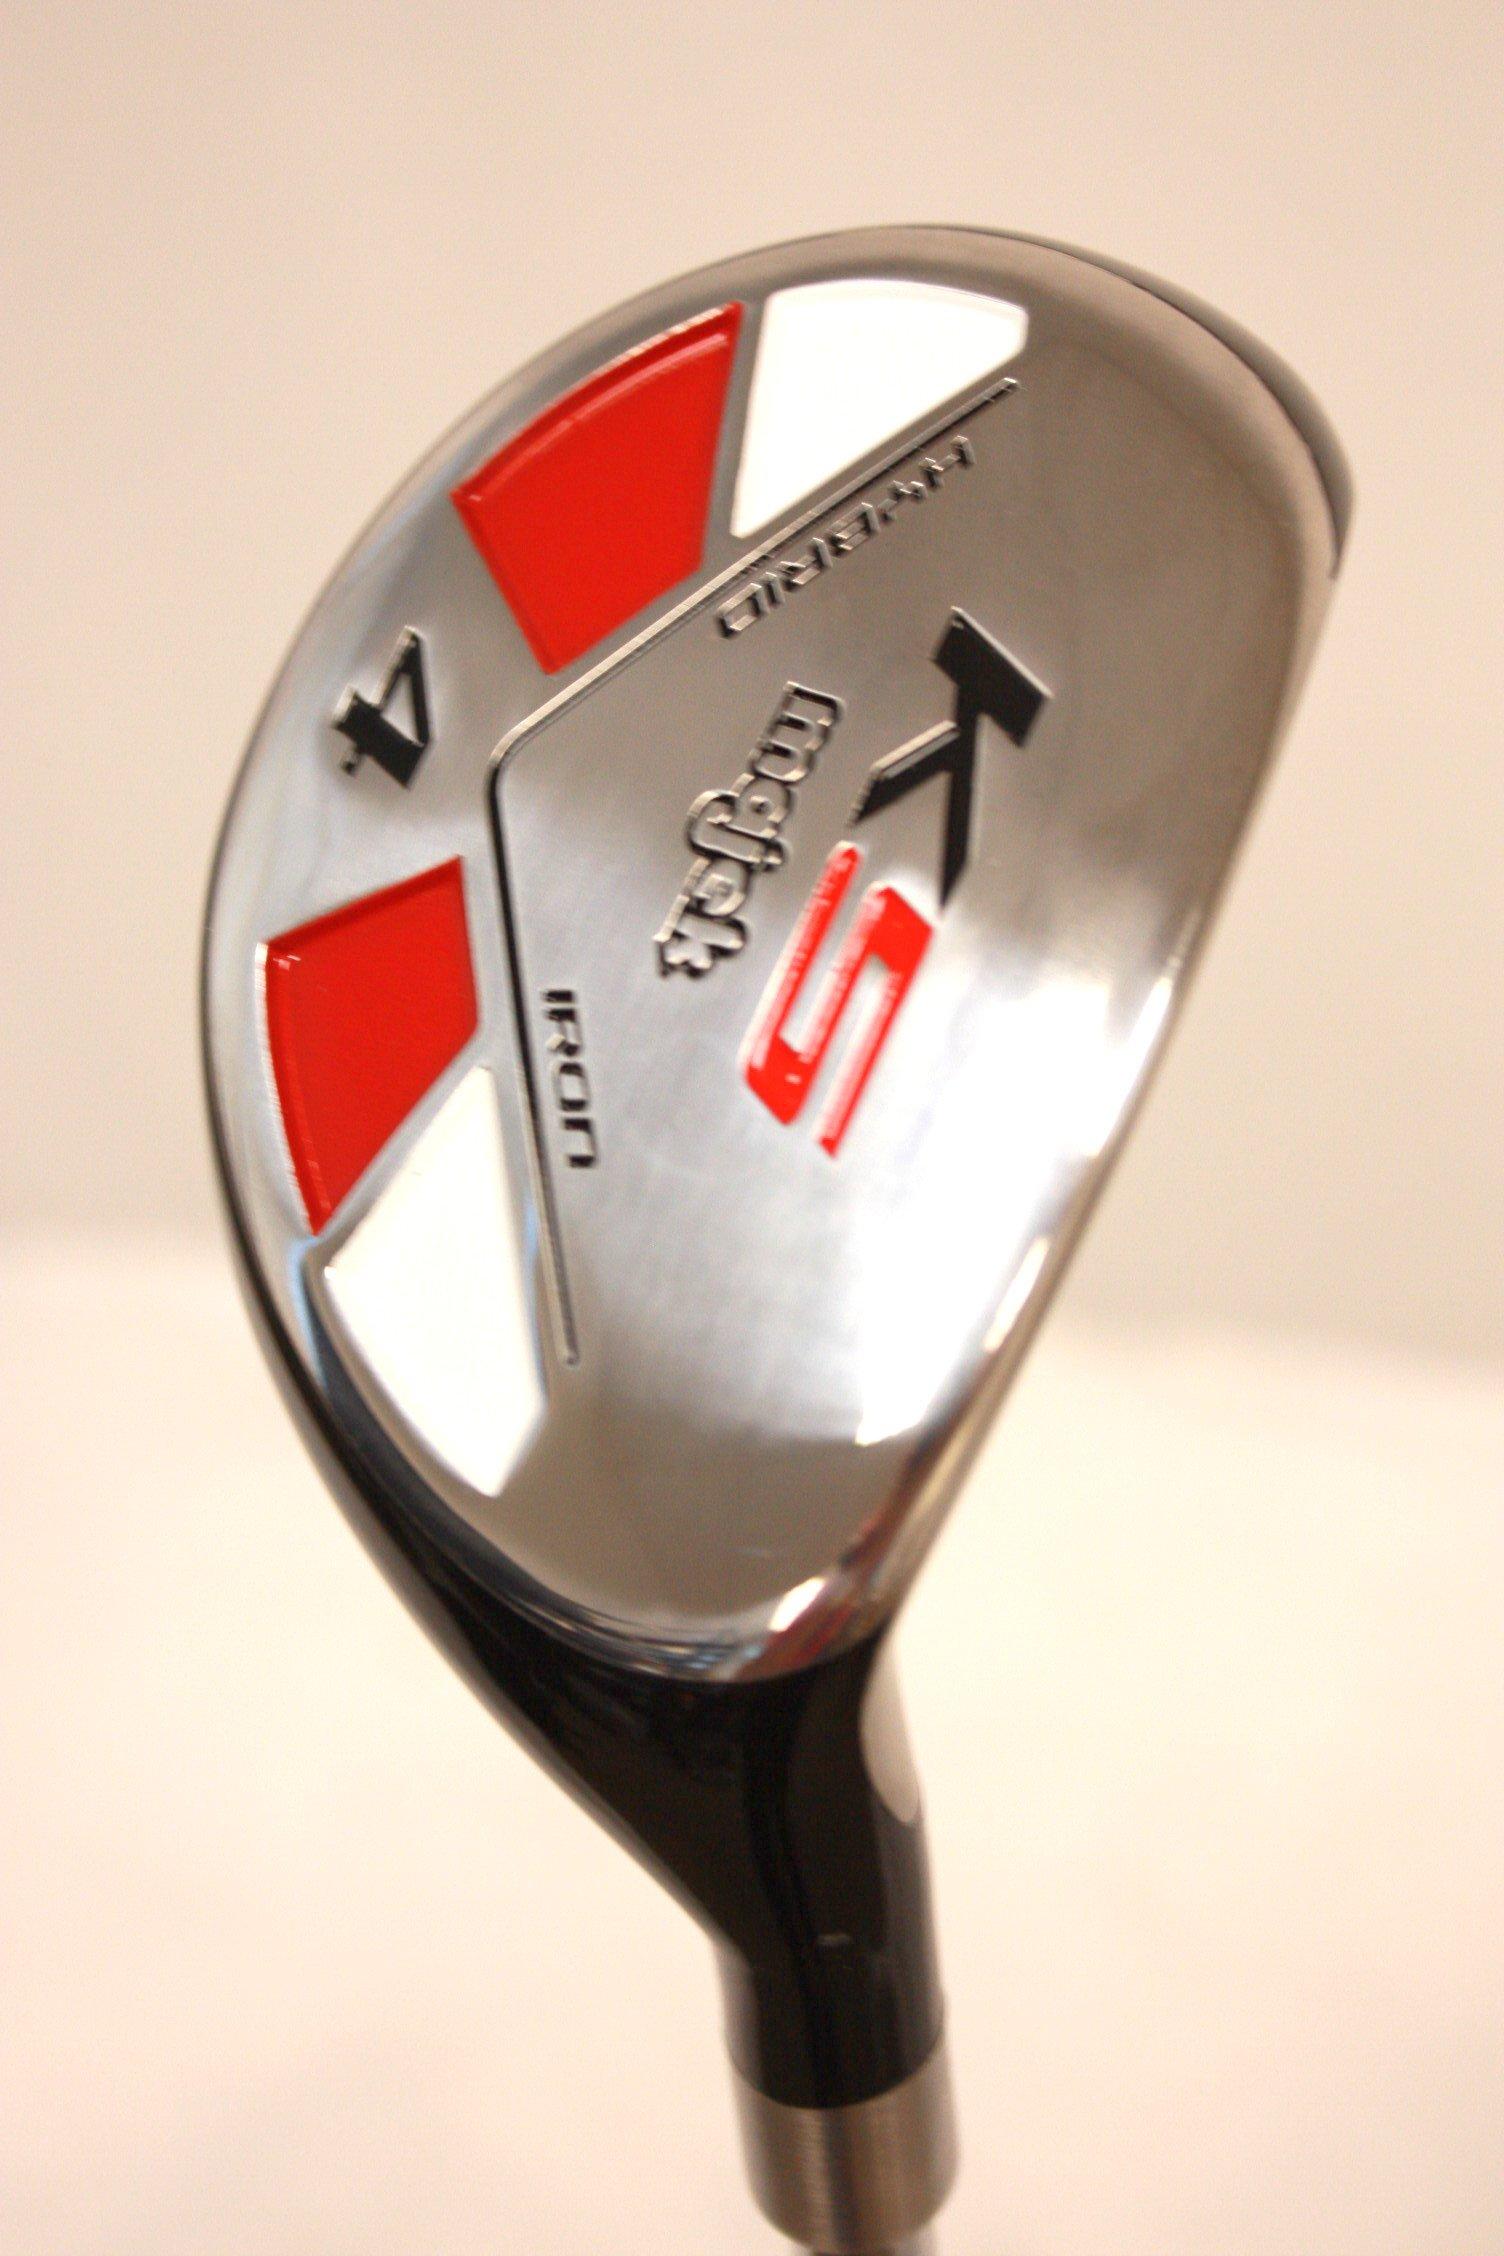 Majek Golf All Hybrid #4 Stiff Flex Right Handed New Rescue Utility S Flex Club by Majek (Image #1)